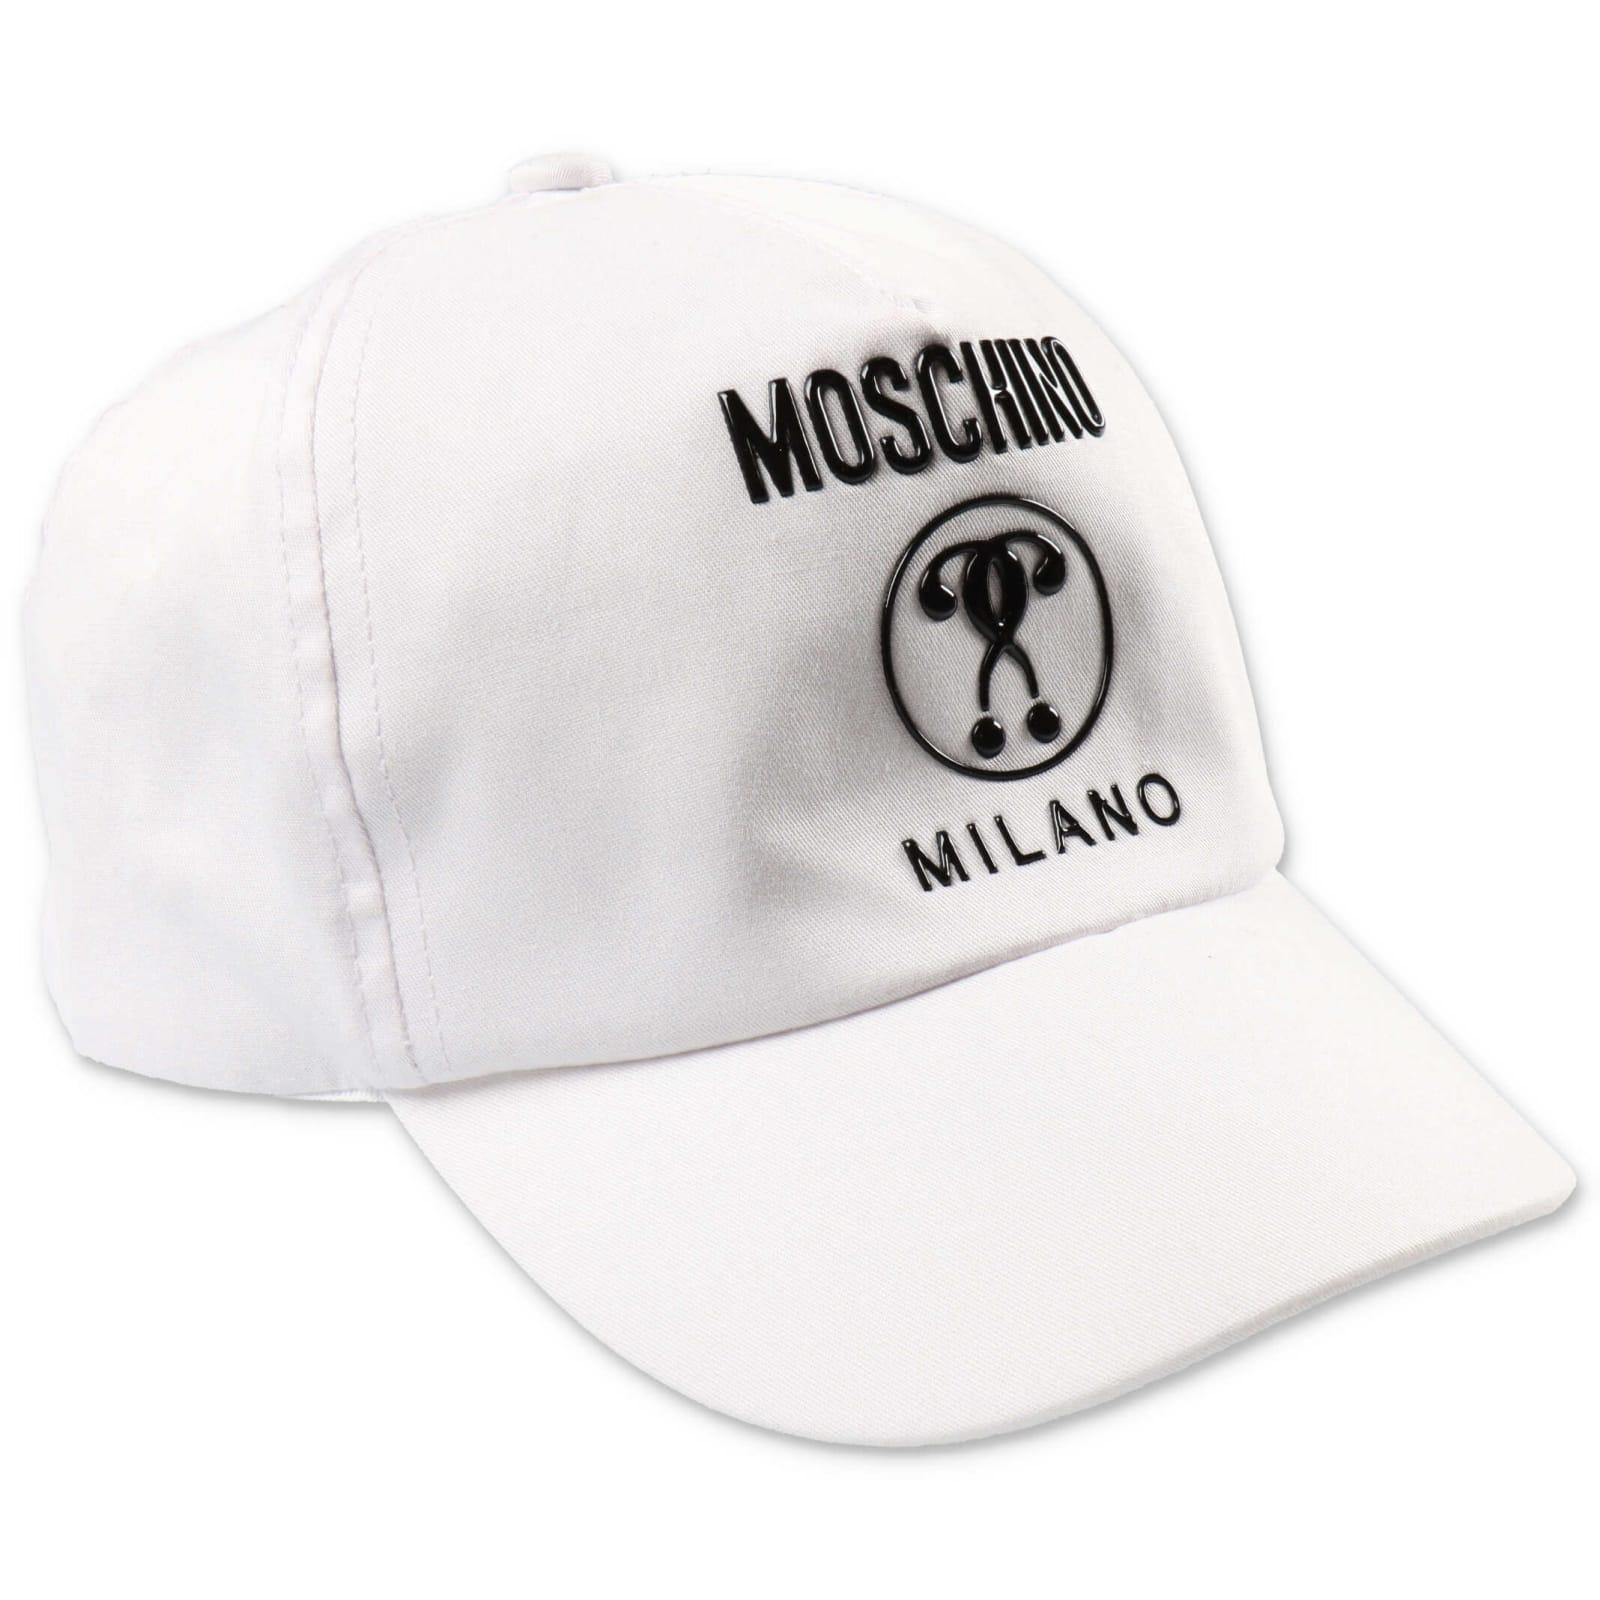 Moschino Accessory